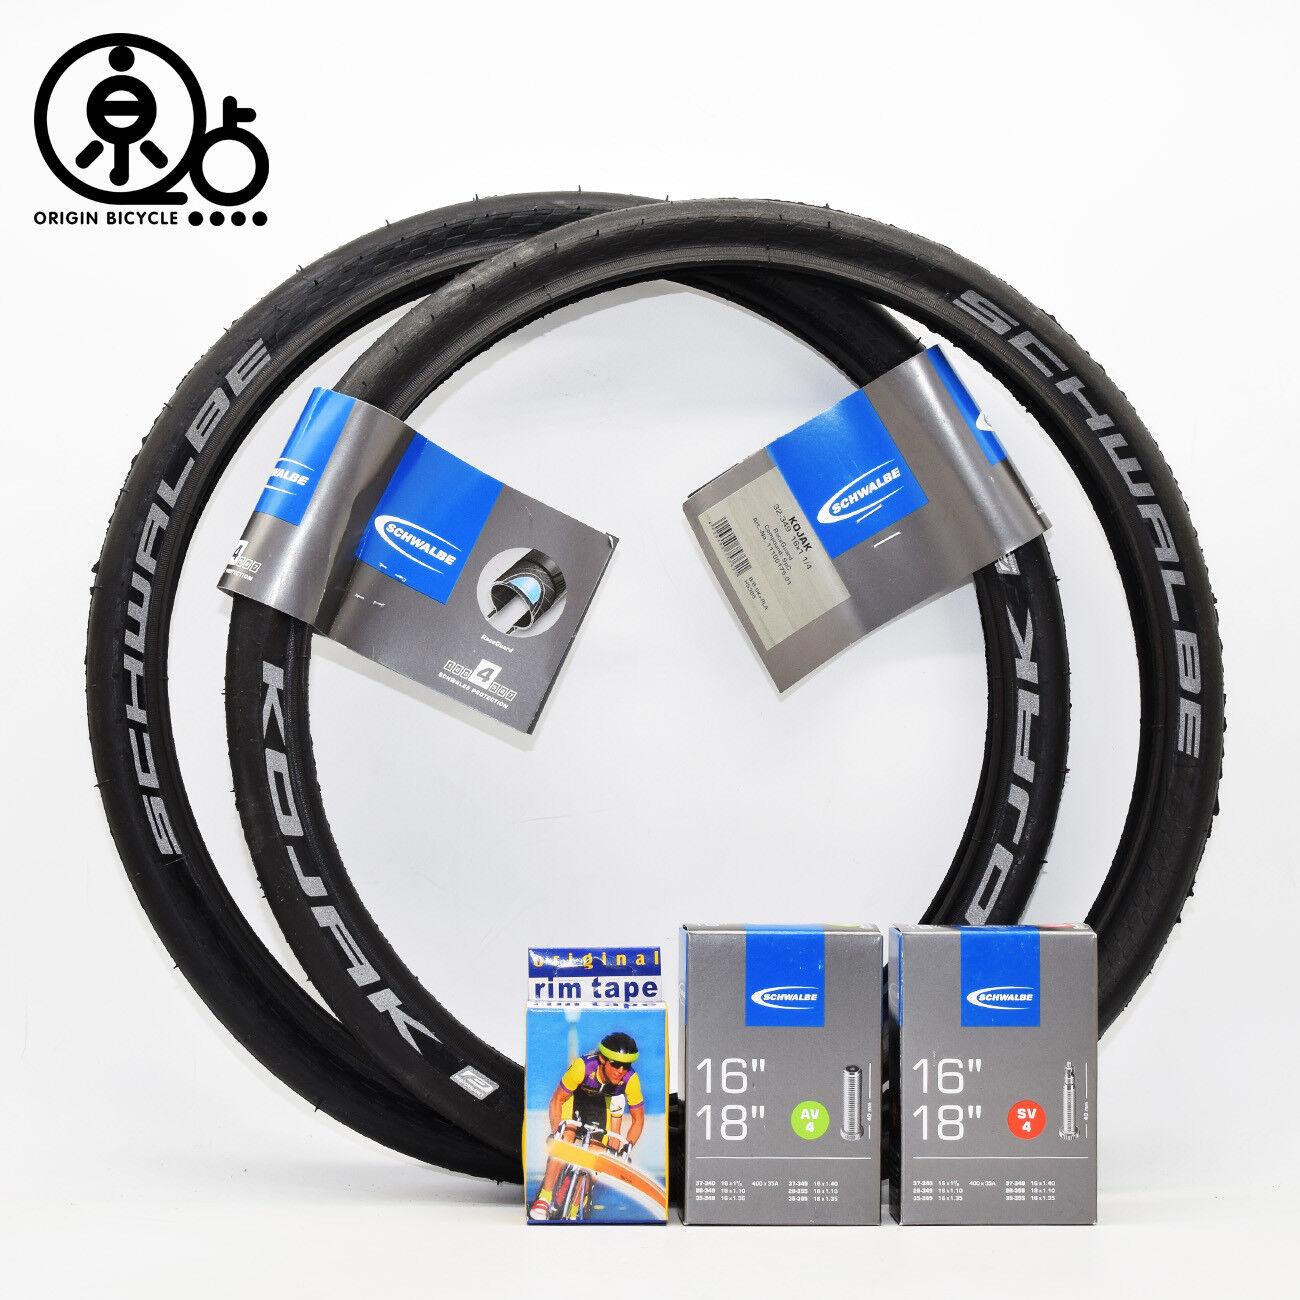 Schwalbe KOJAK 16x1 1 4  (32-349) HS385 Brompton Bike Tire Tyre Tube Rim Tap  70% off cheap